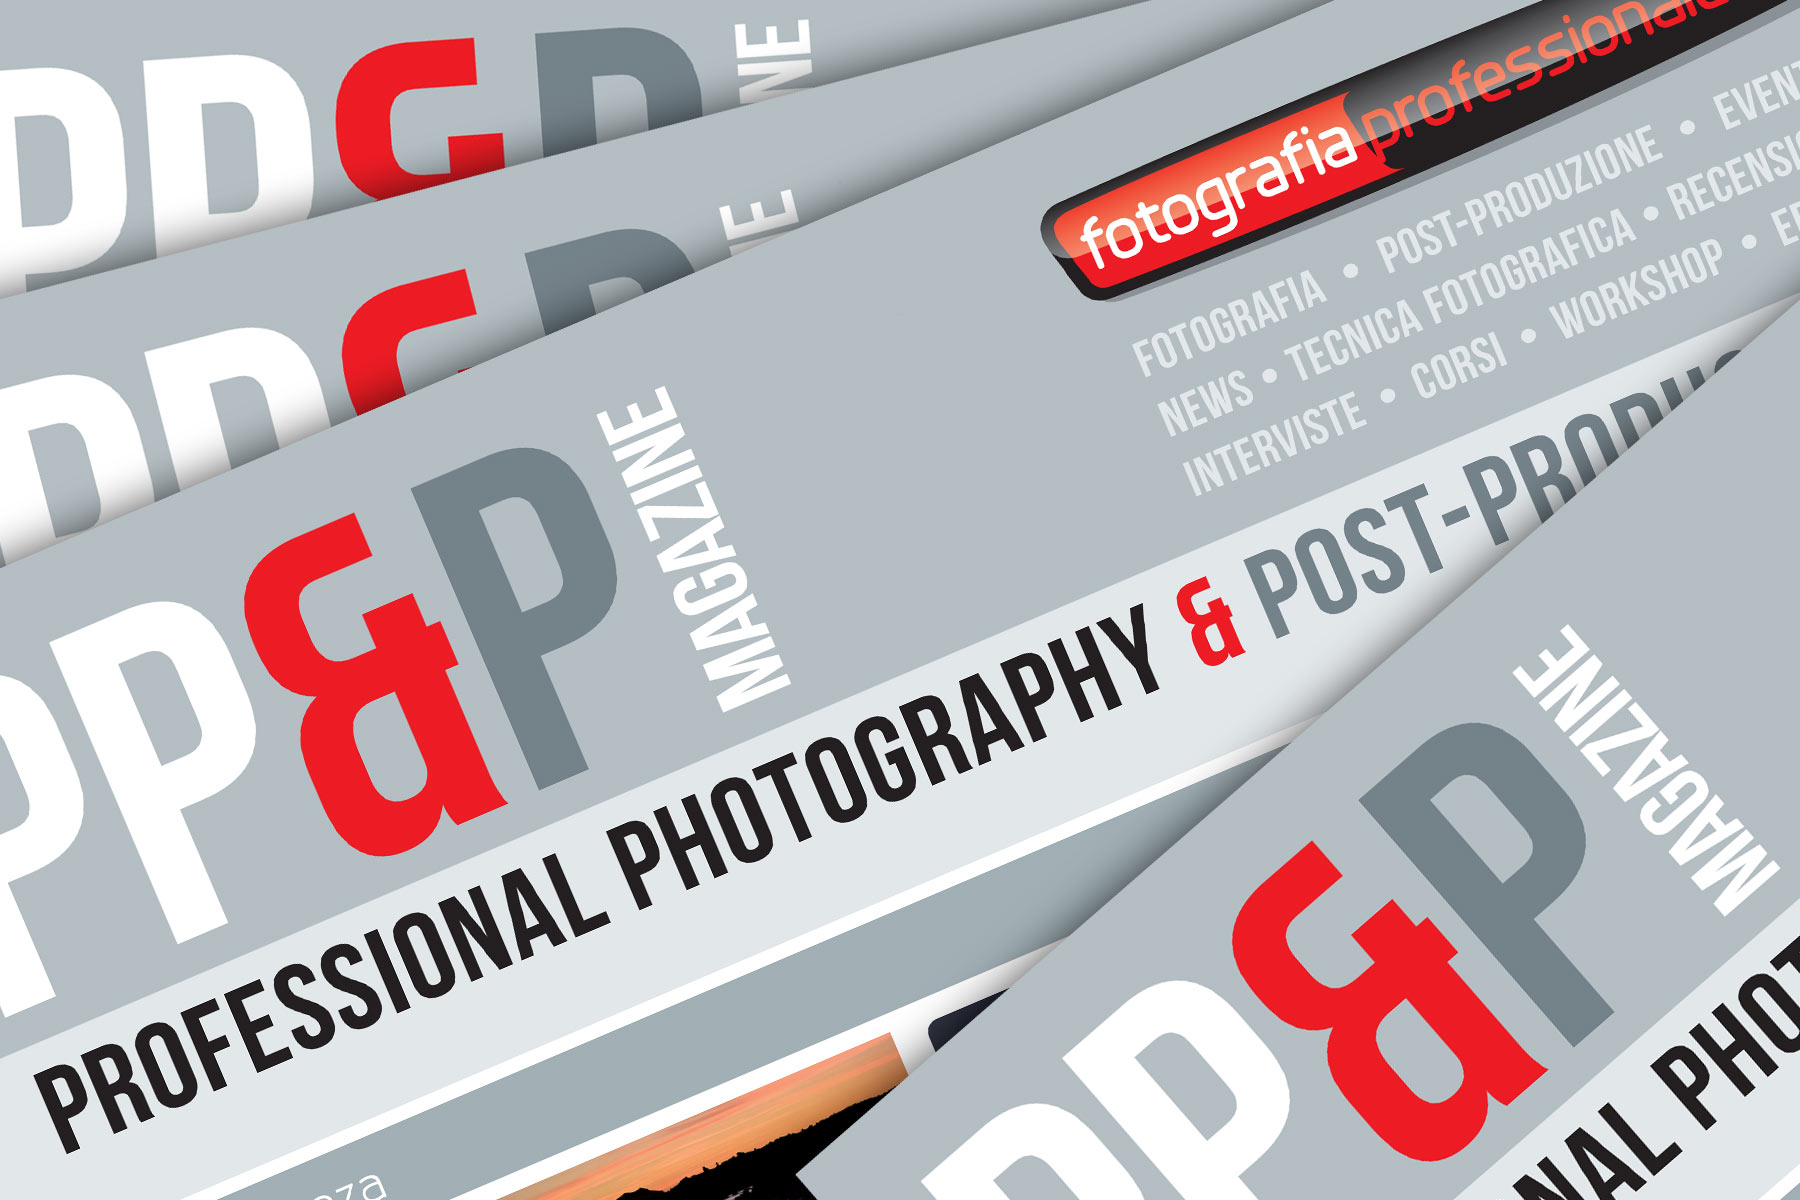 Nasce Professional Photography & Post-production, la nostra nuova e-zine!